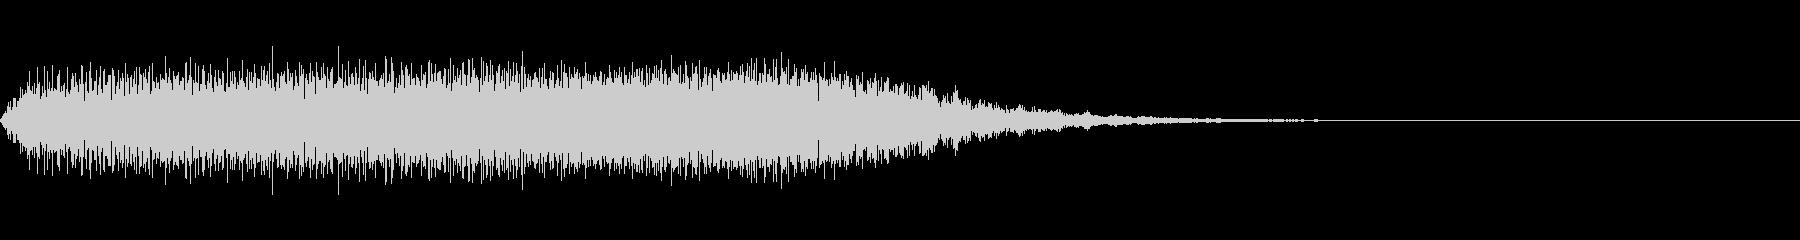 Quiz クイズ向け効果音 ポワーン!!の未再生の波形